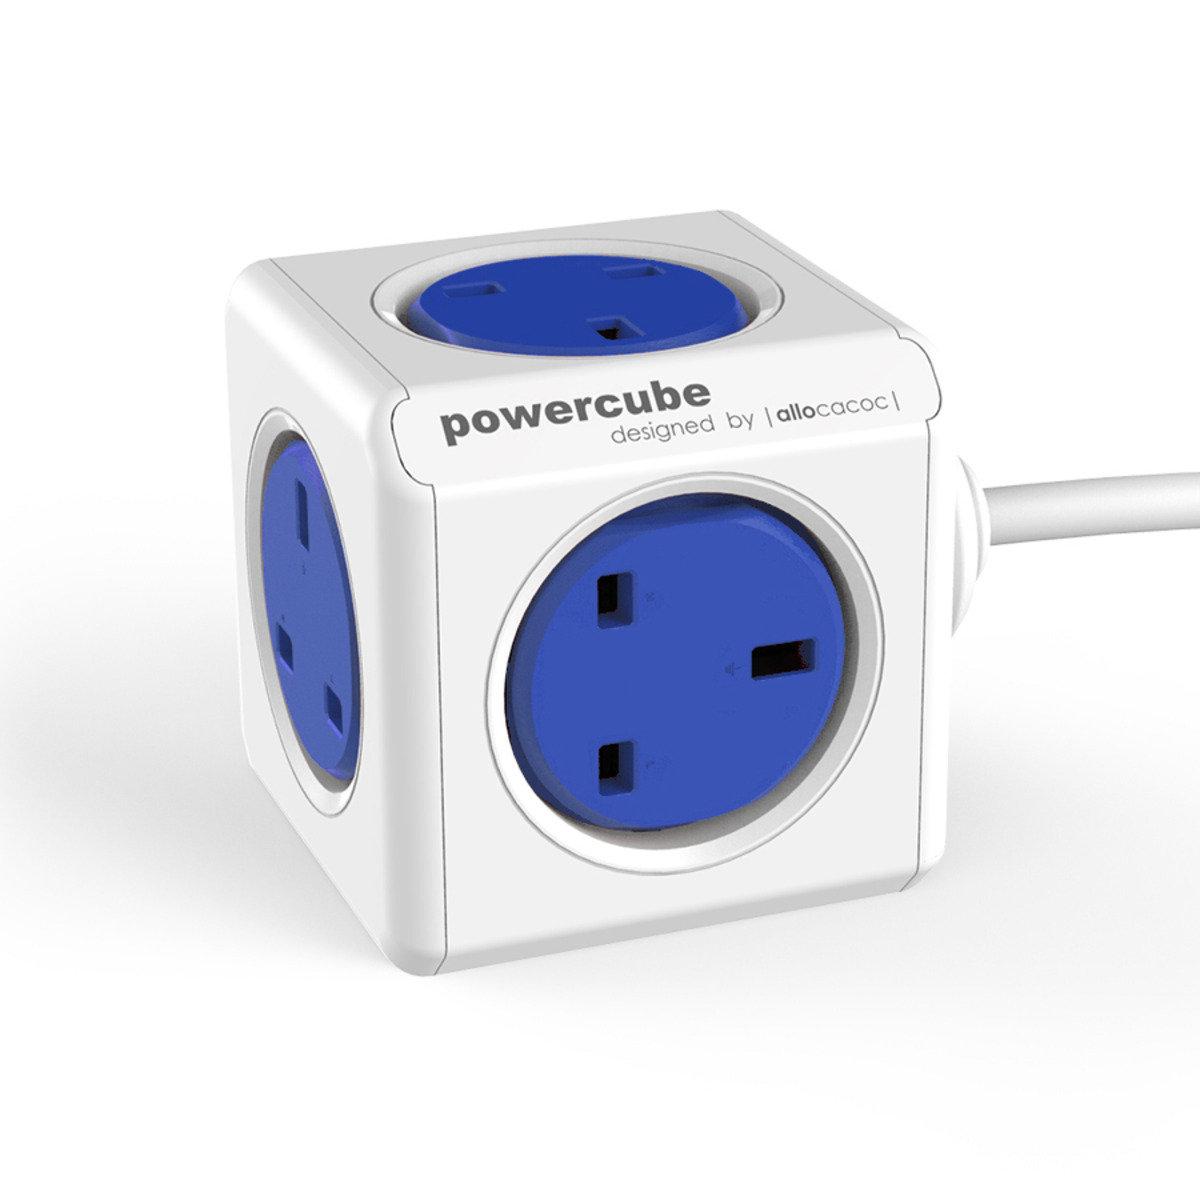 荷蘭 Allocacoc Powercube 5 插頭插座 (藍)